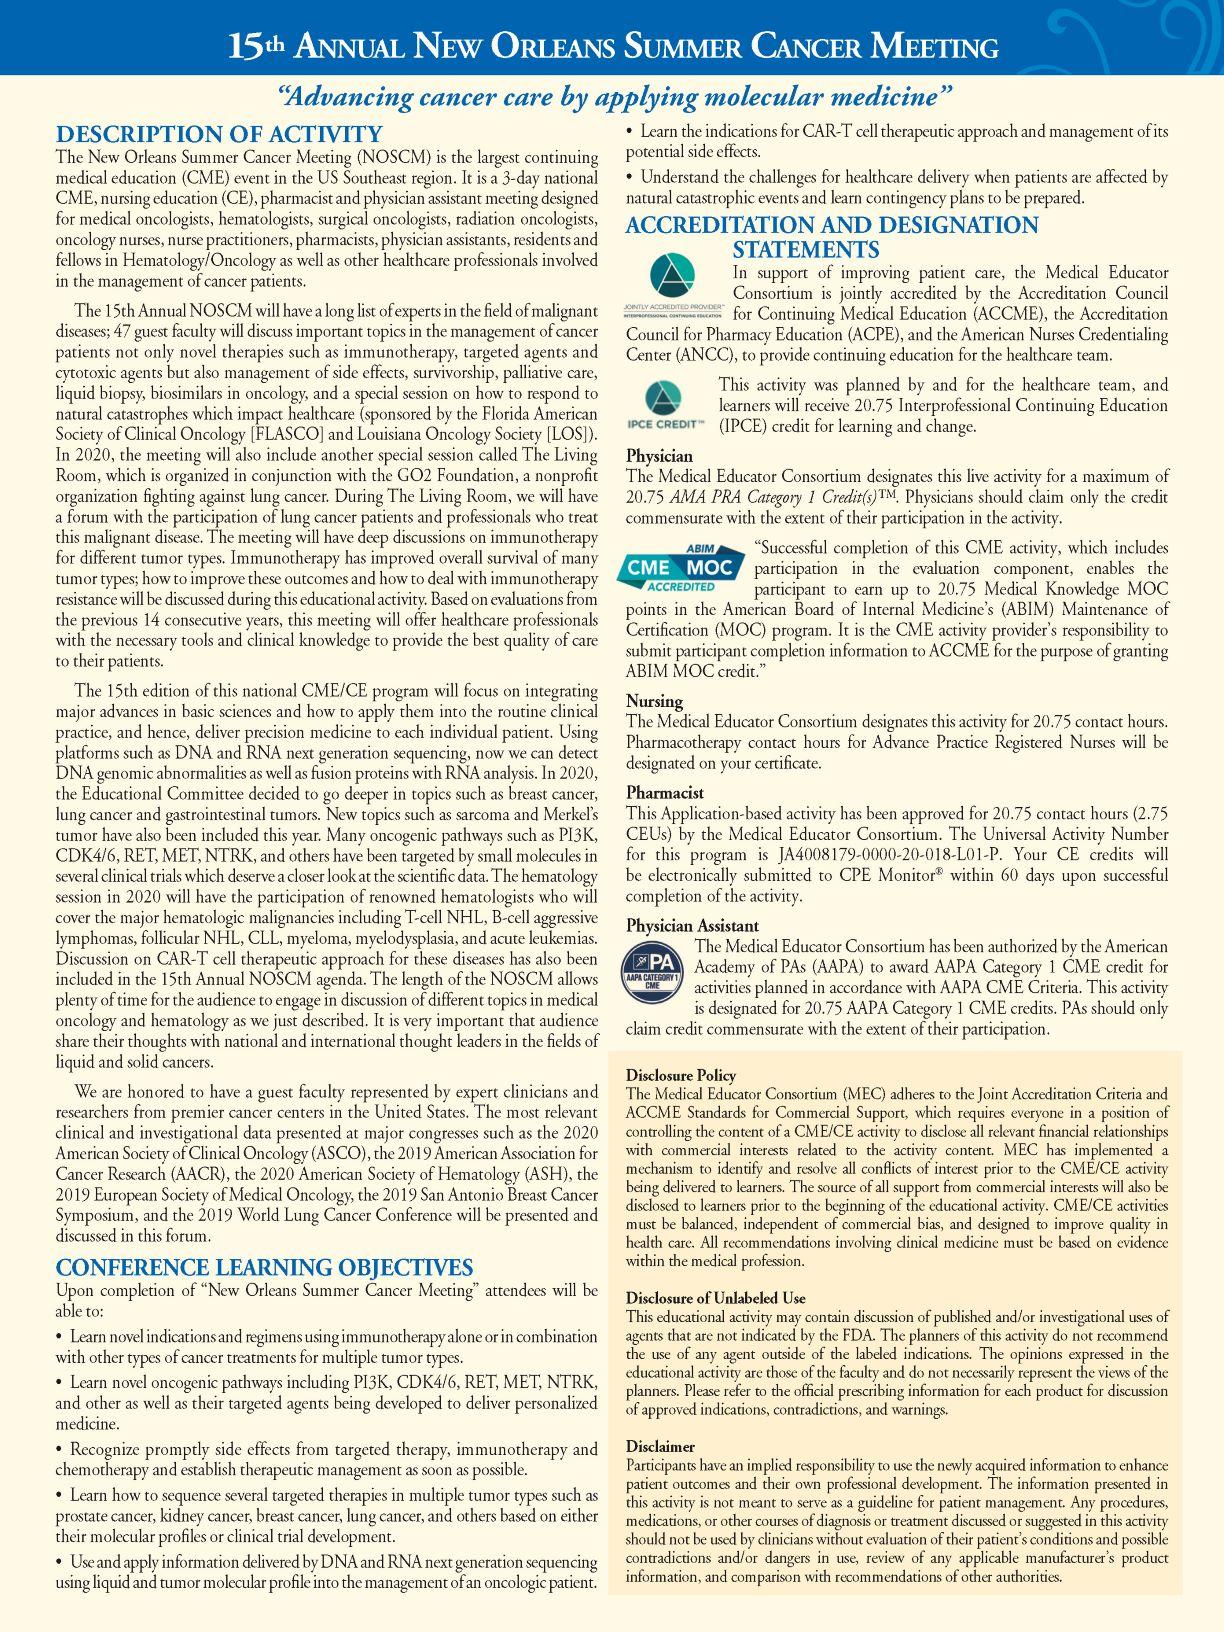 122965 - NOLA 2020 Brochure- Description&Objectives copy